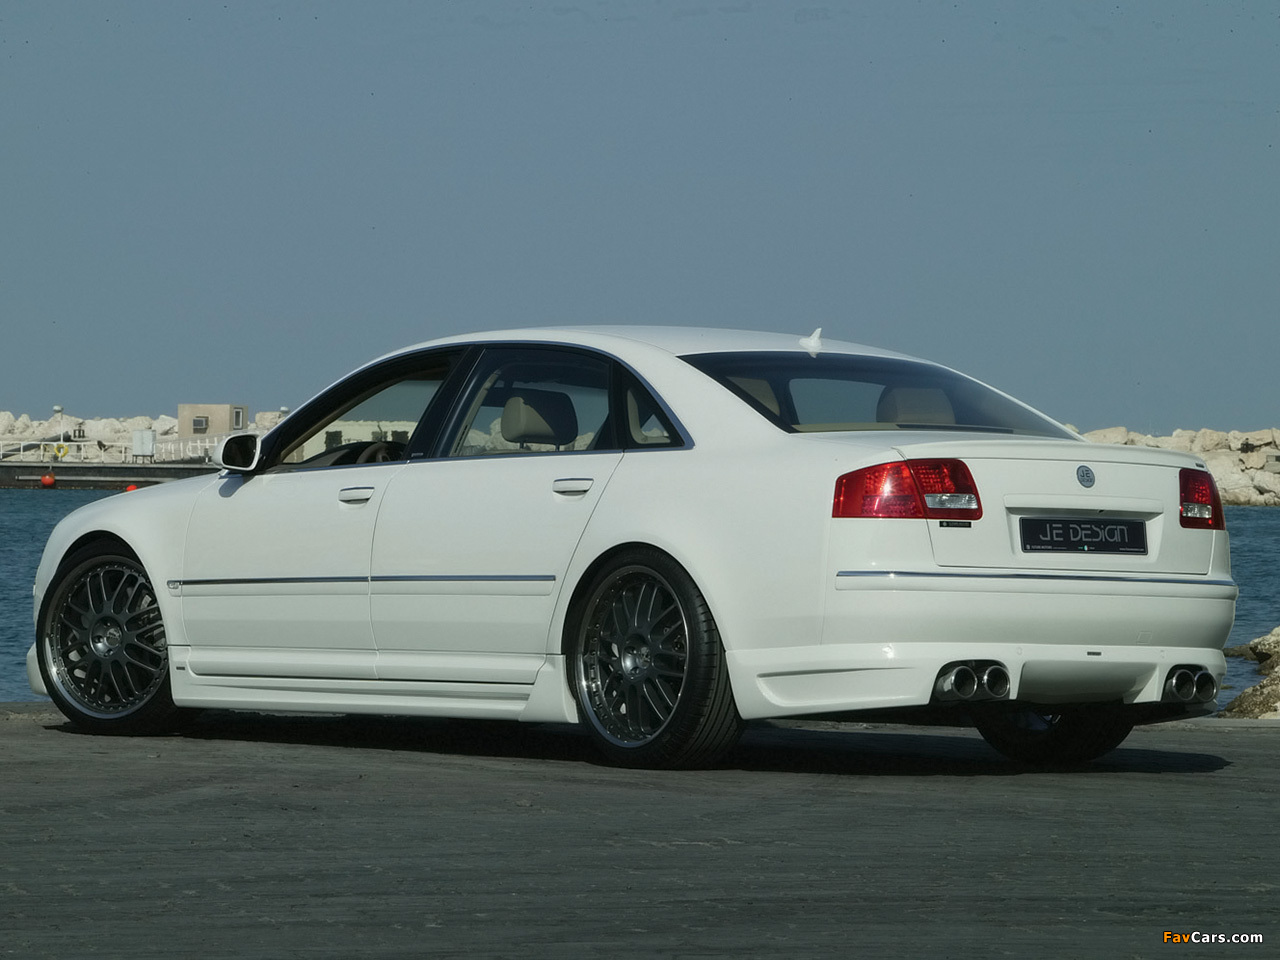 Je Design Audi A8 2006 08 Wallpapers 1280x960